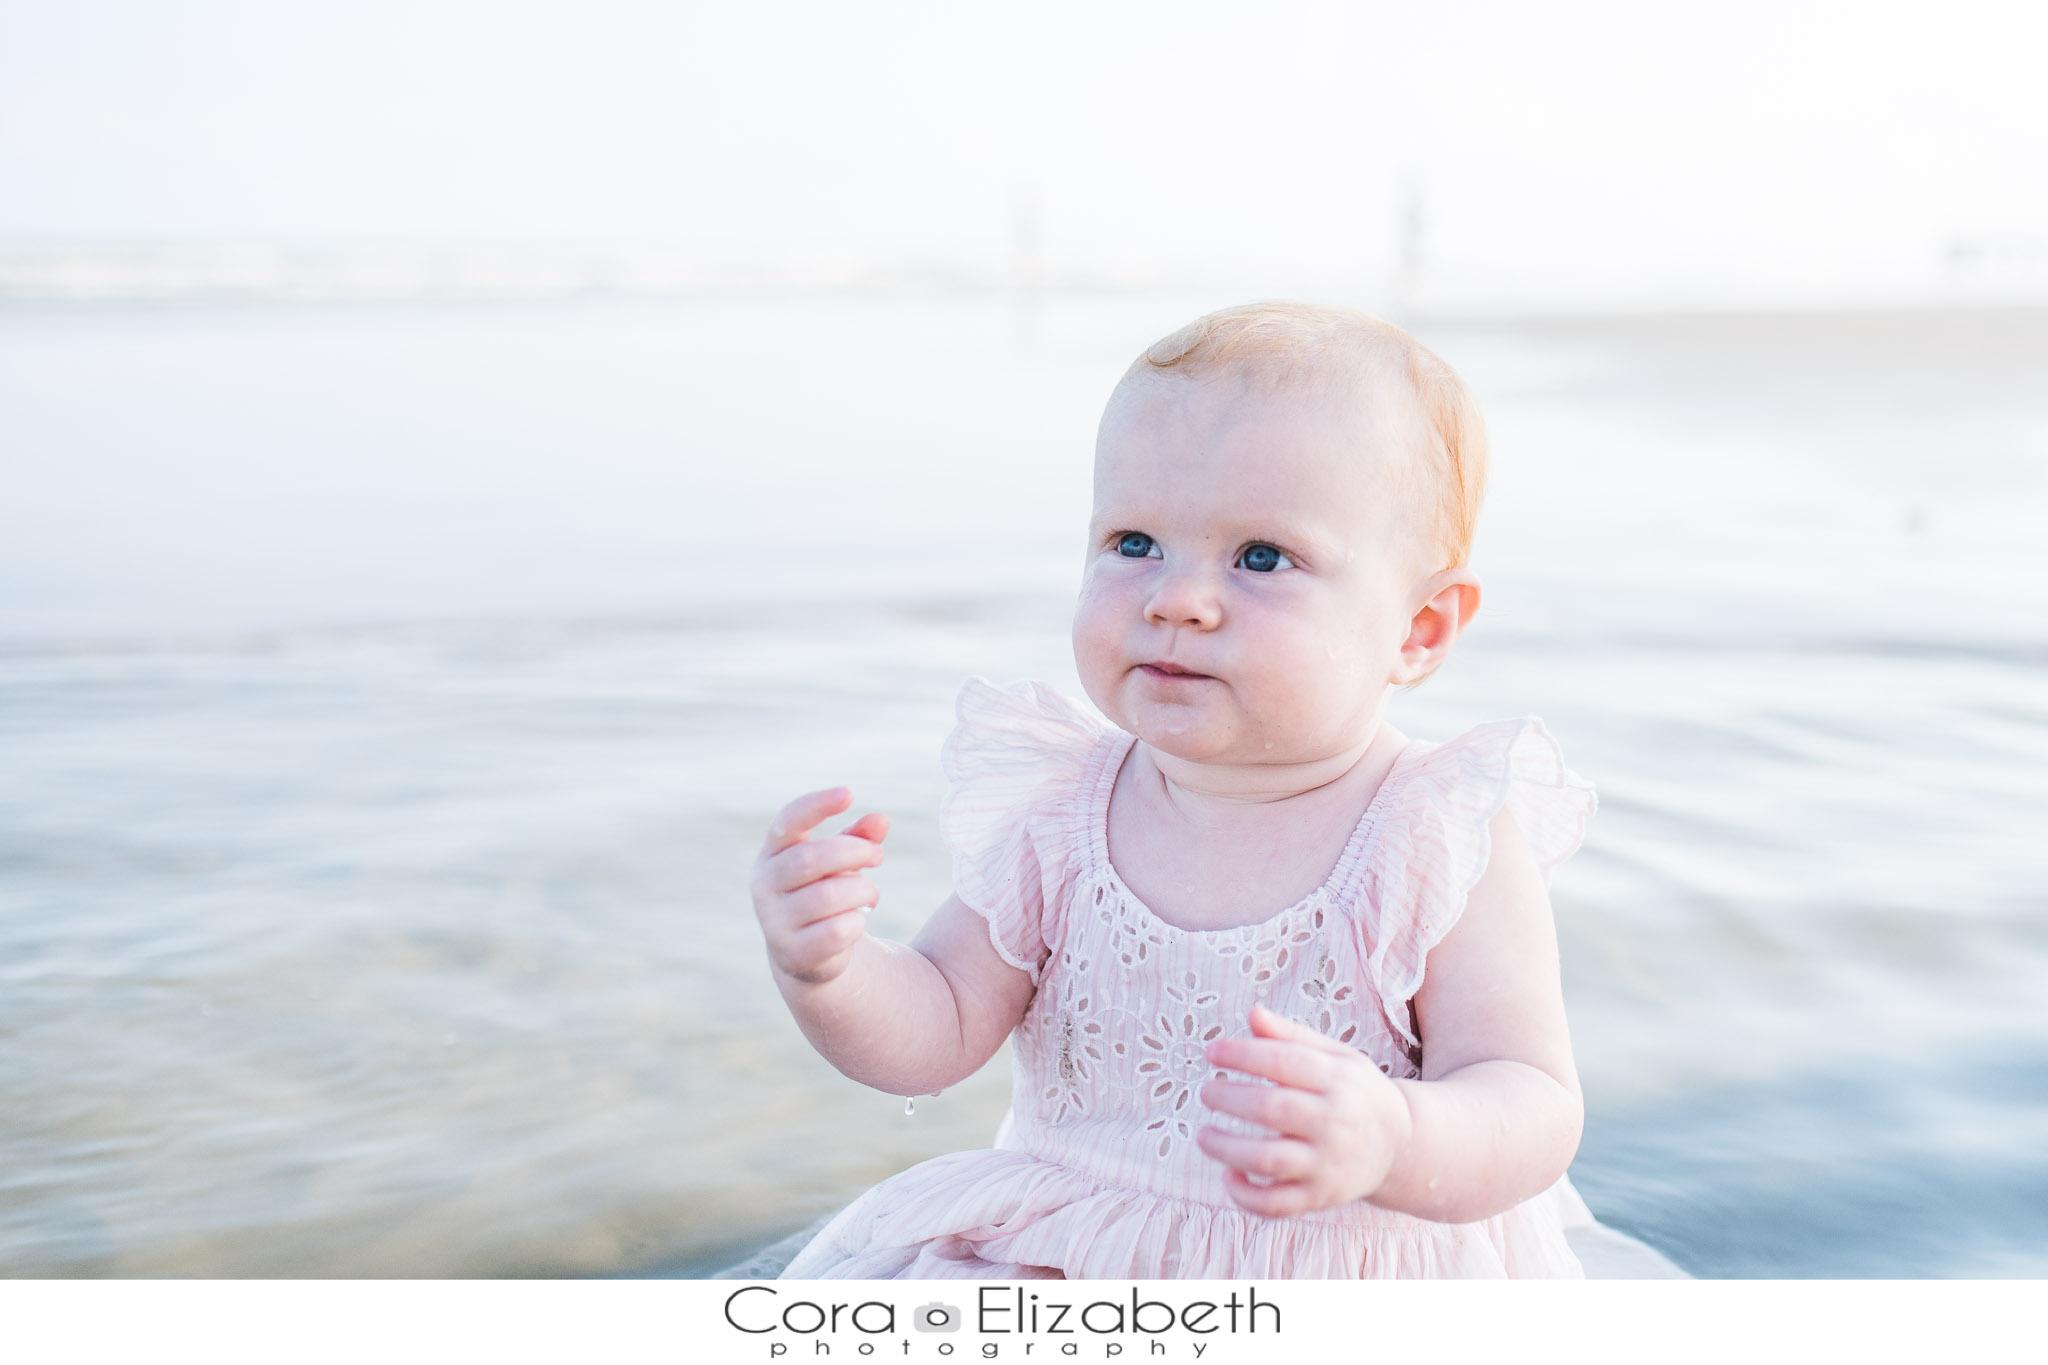 CEP_Baby_Cora_2019_005_website.jpg